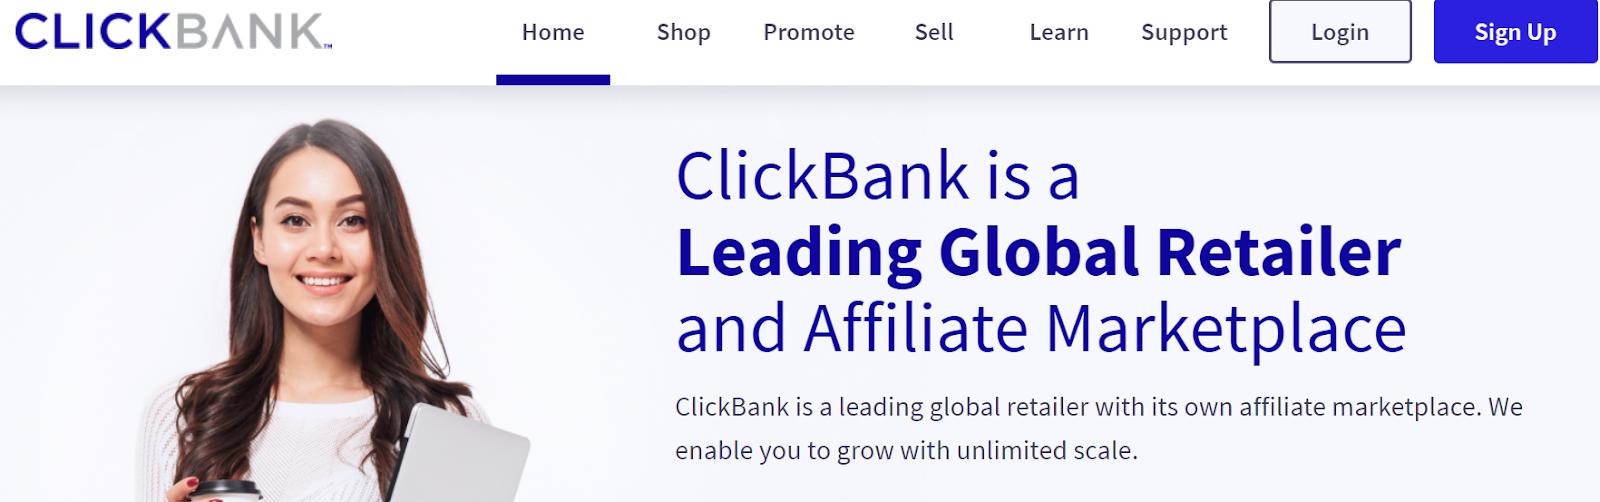 ClickBank affiliate marketplace